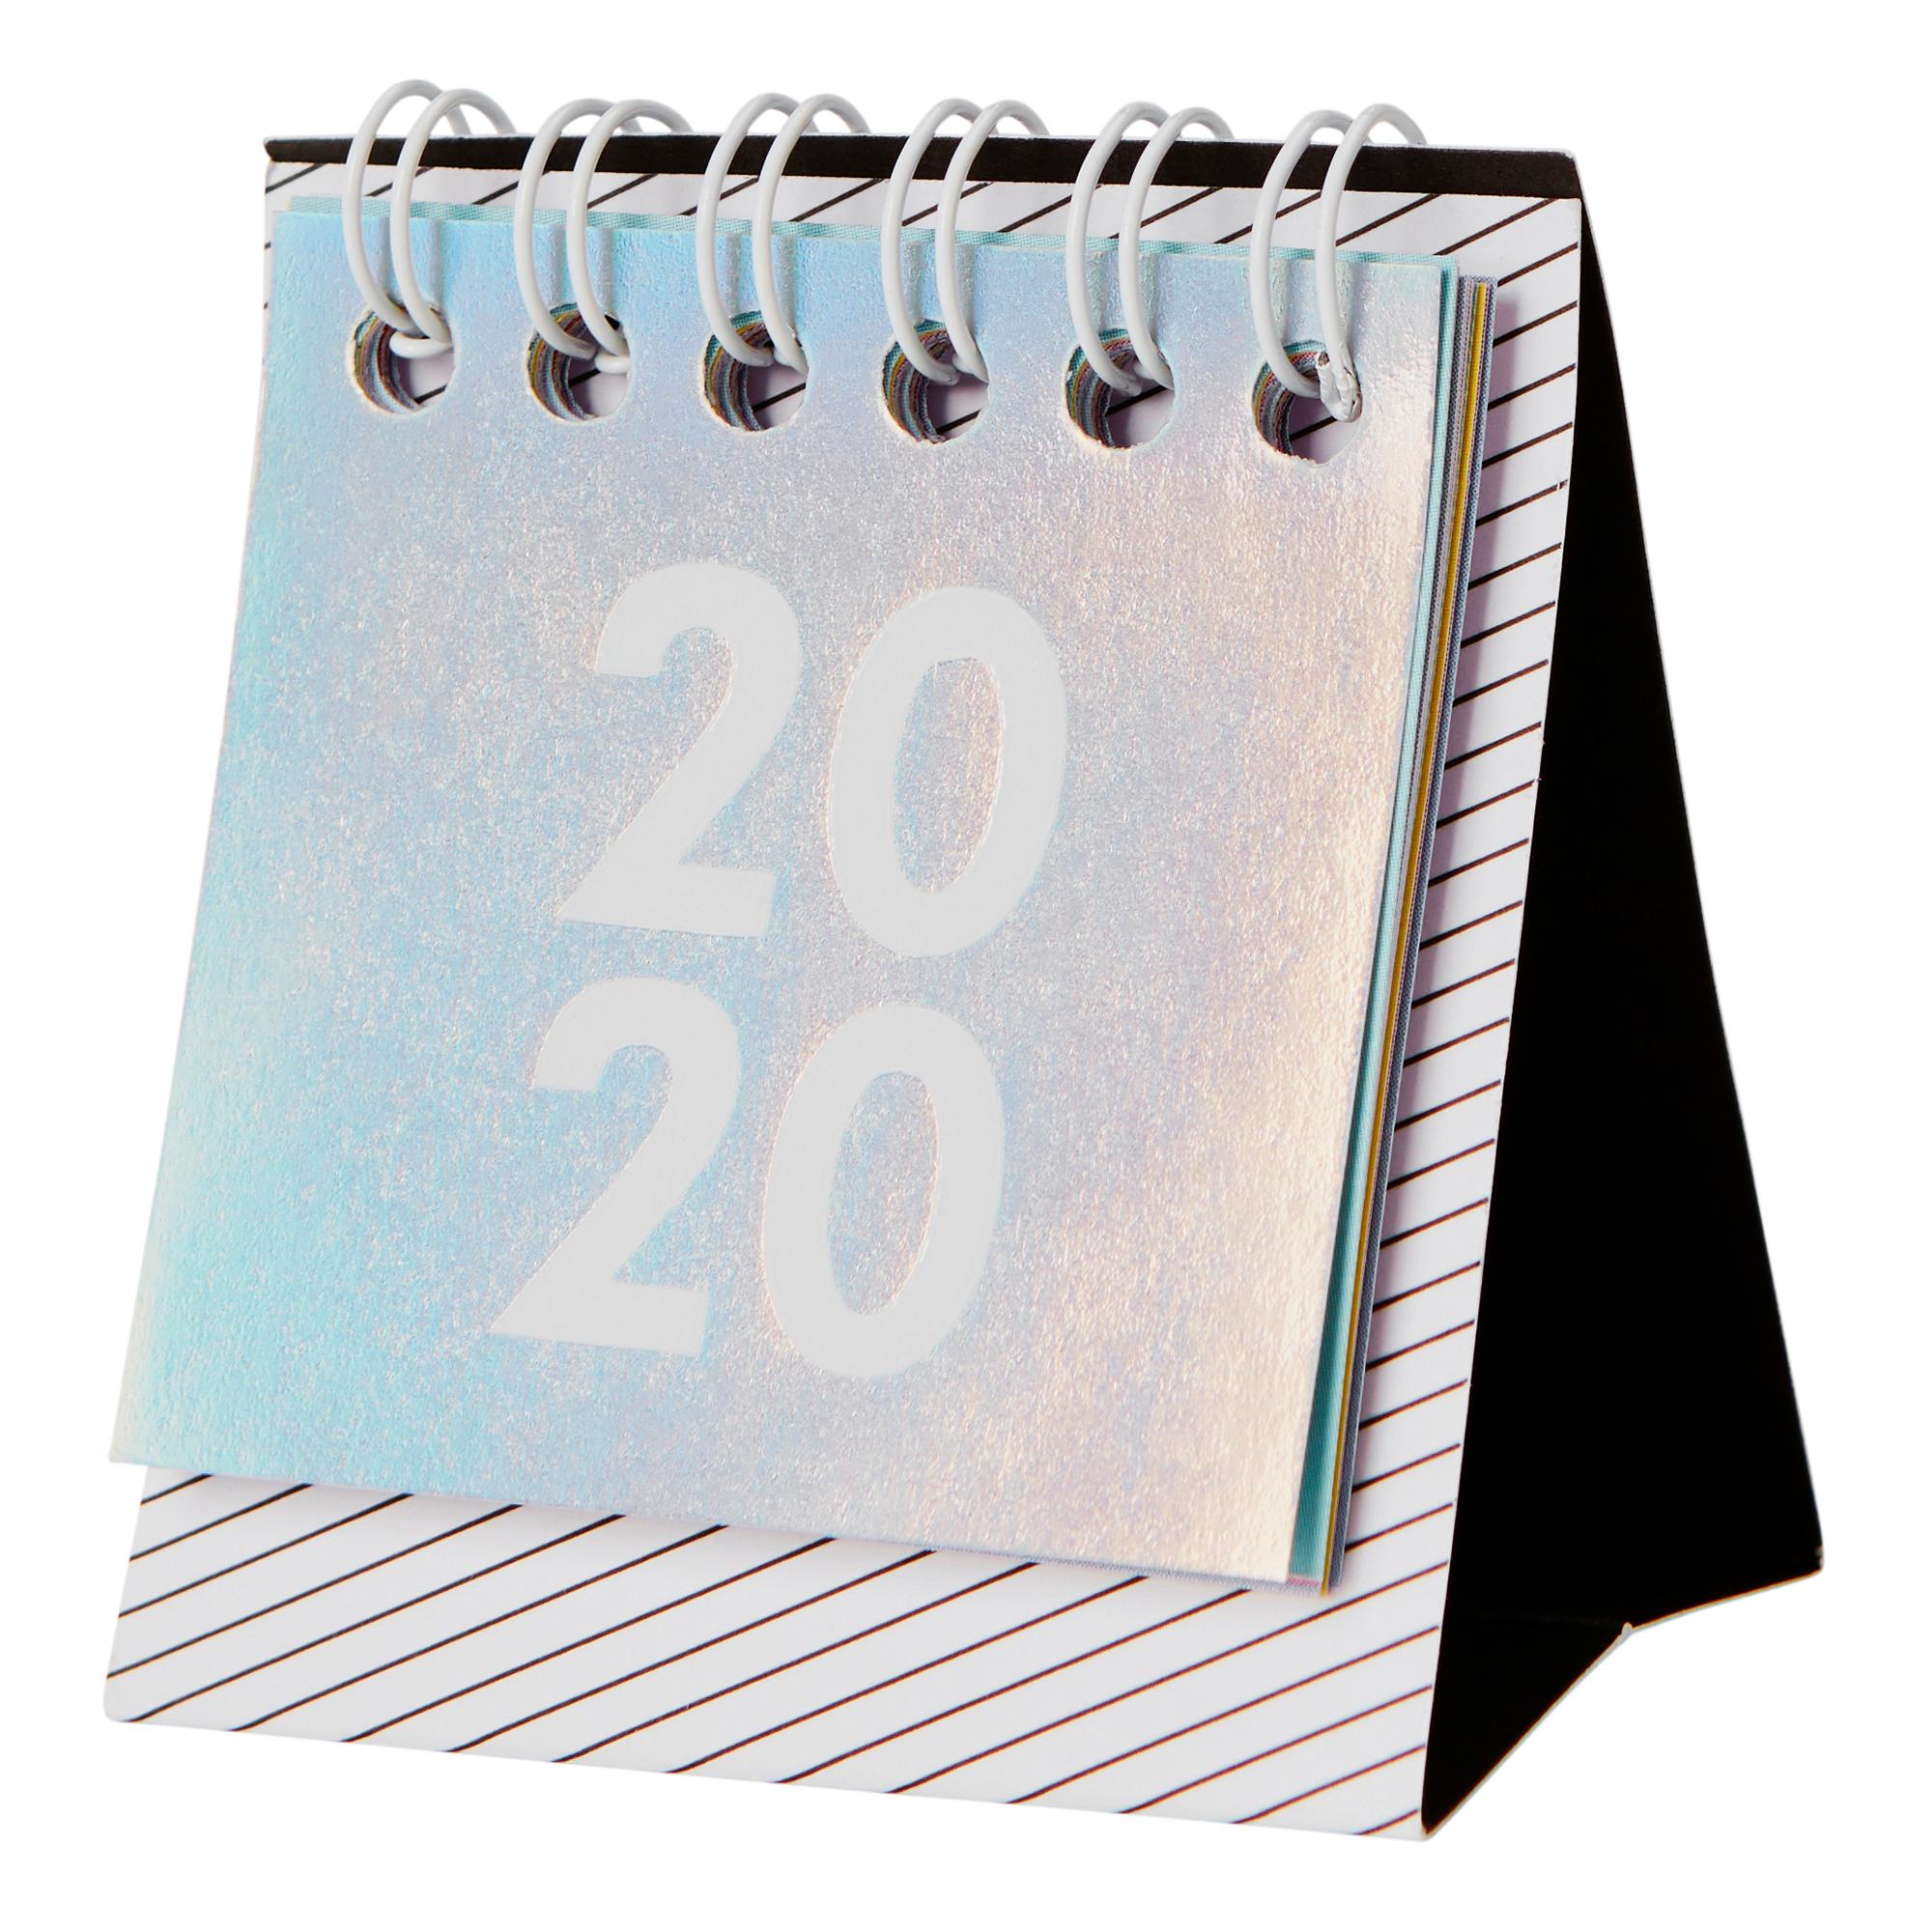 2020 Cute Mini Desk Calendar Holographic: Be Kind